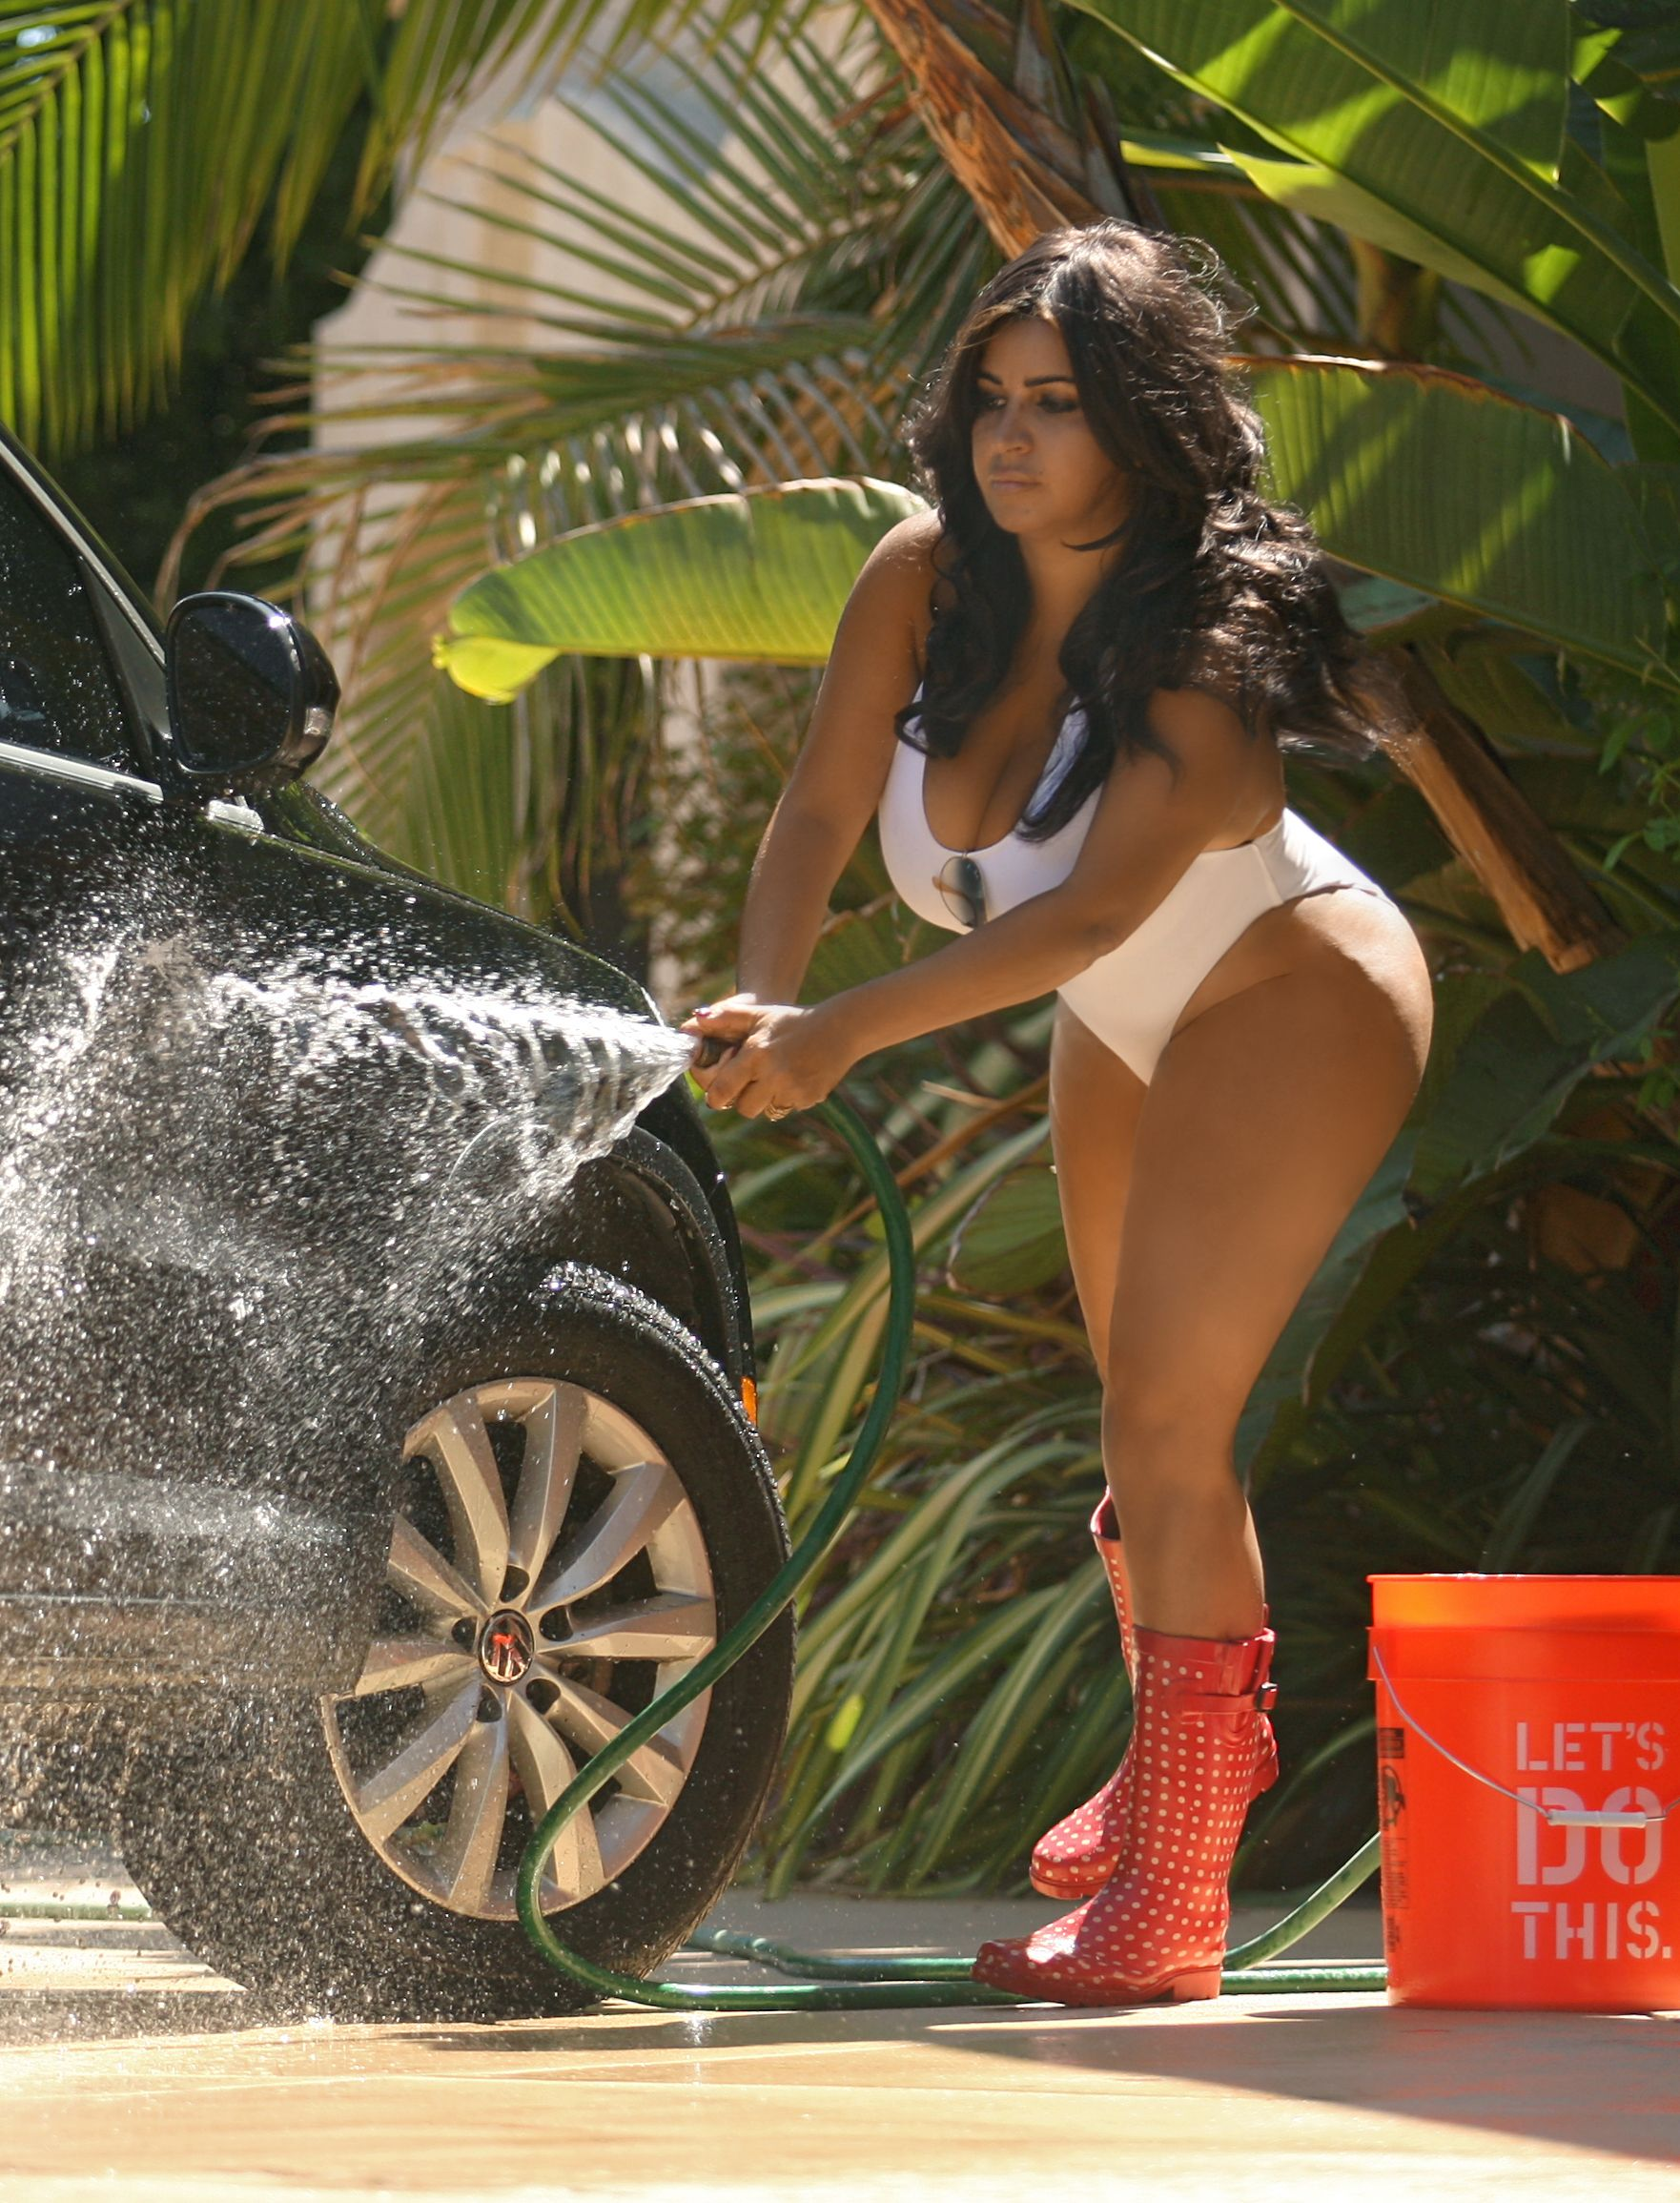 Bikini Mercedes Javid nude (61 photo), Sexy, Leaked, Boobs, lingerie 2020